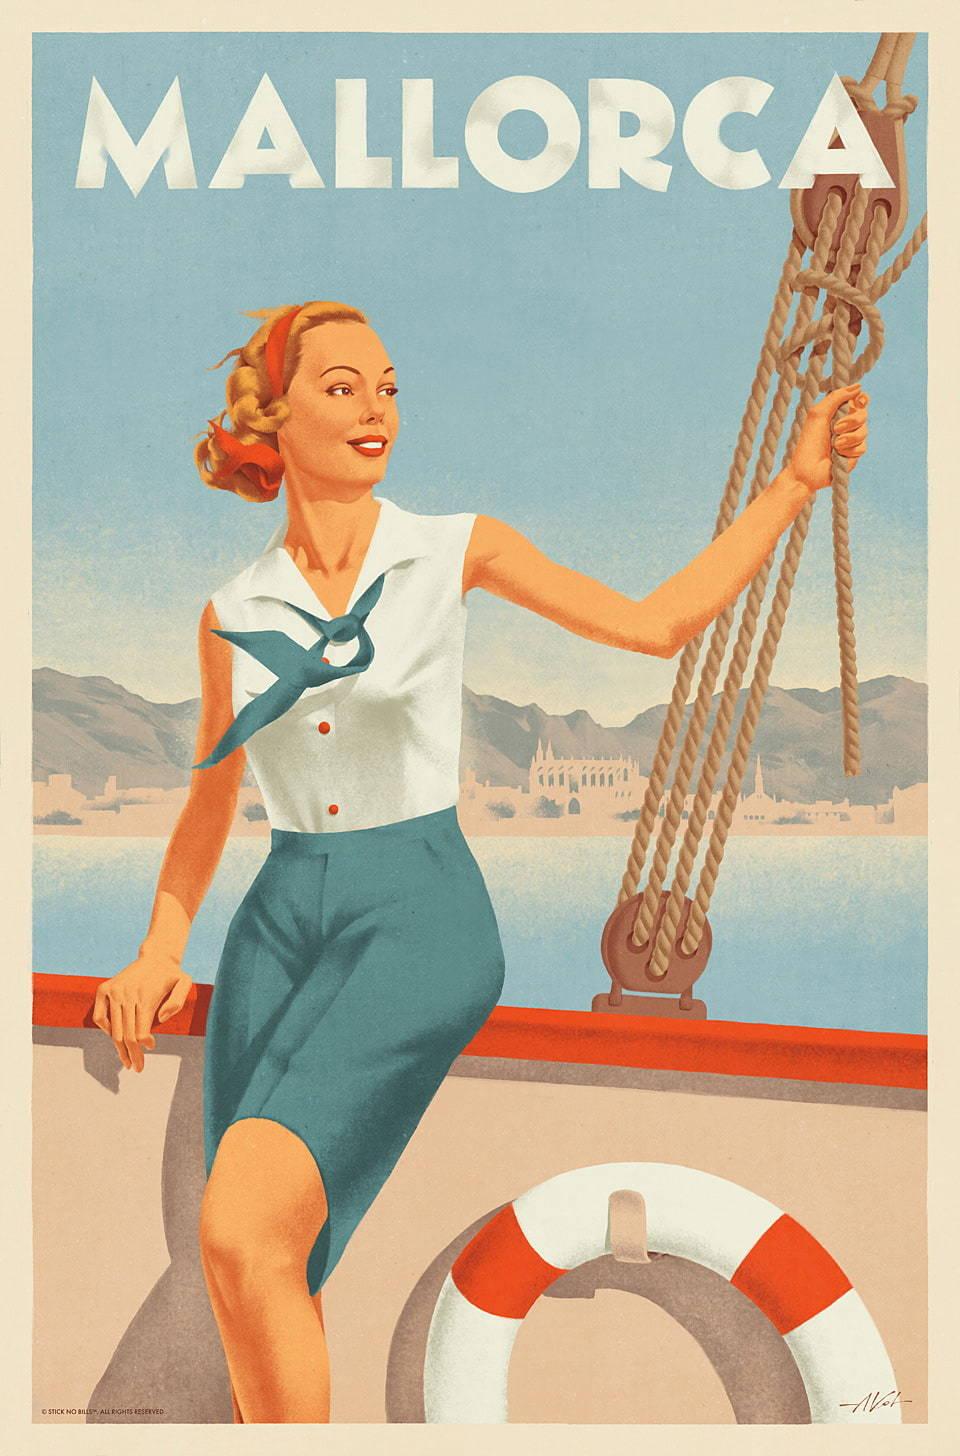 Mallorca Travel Posters II